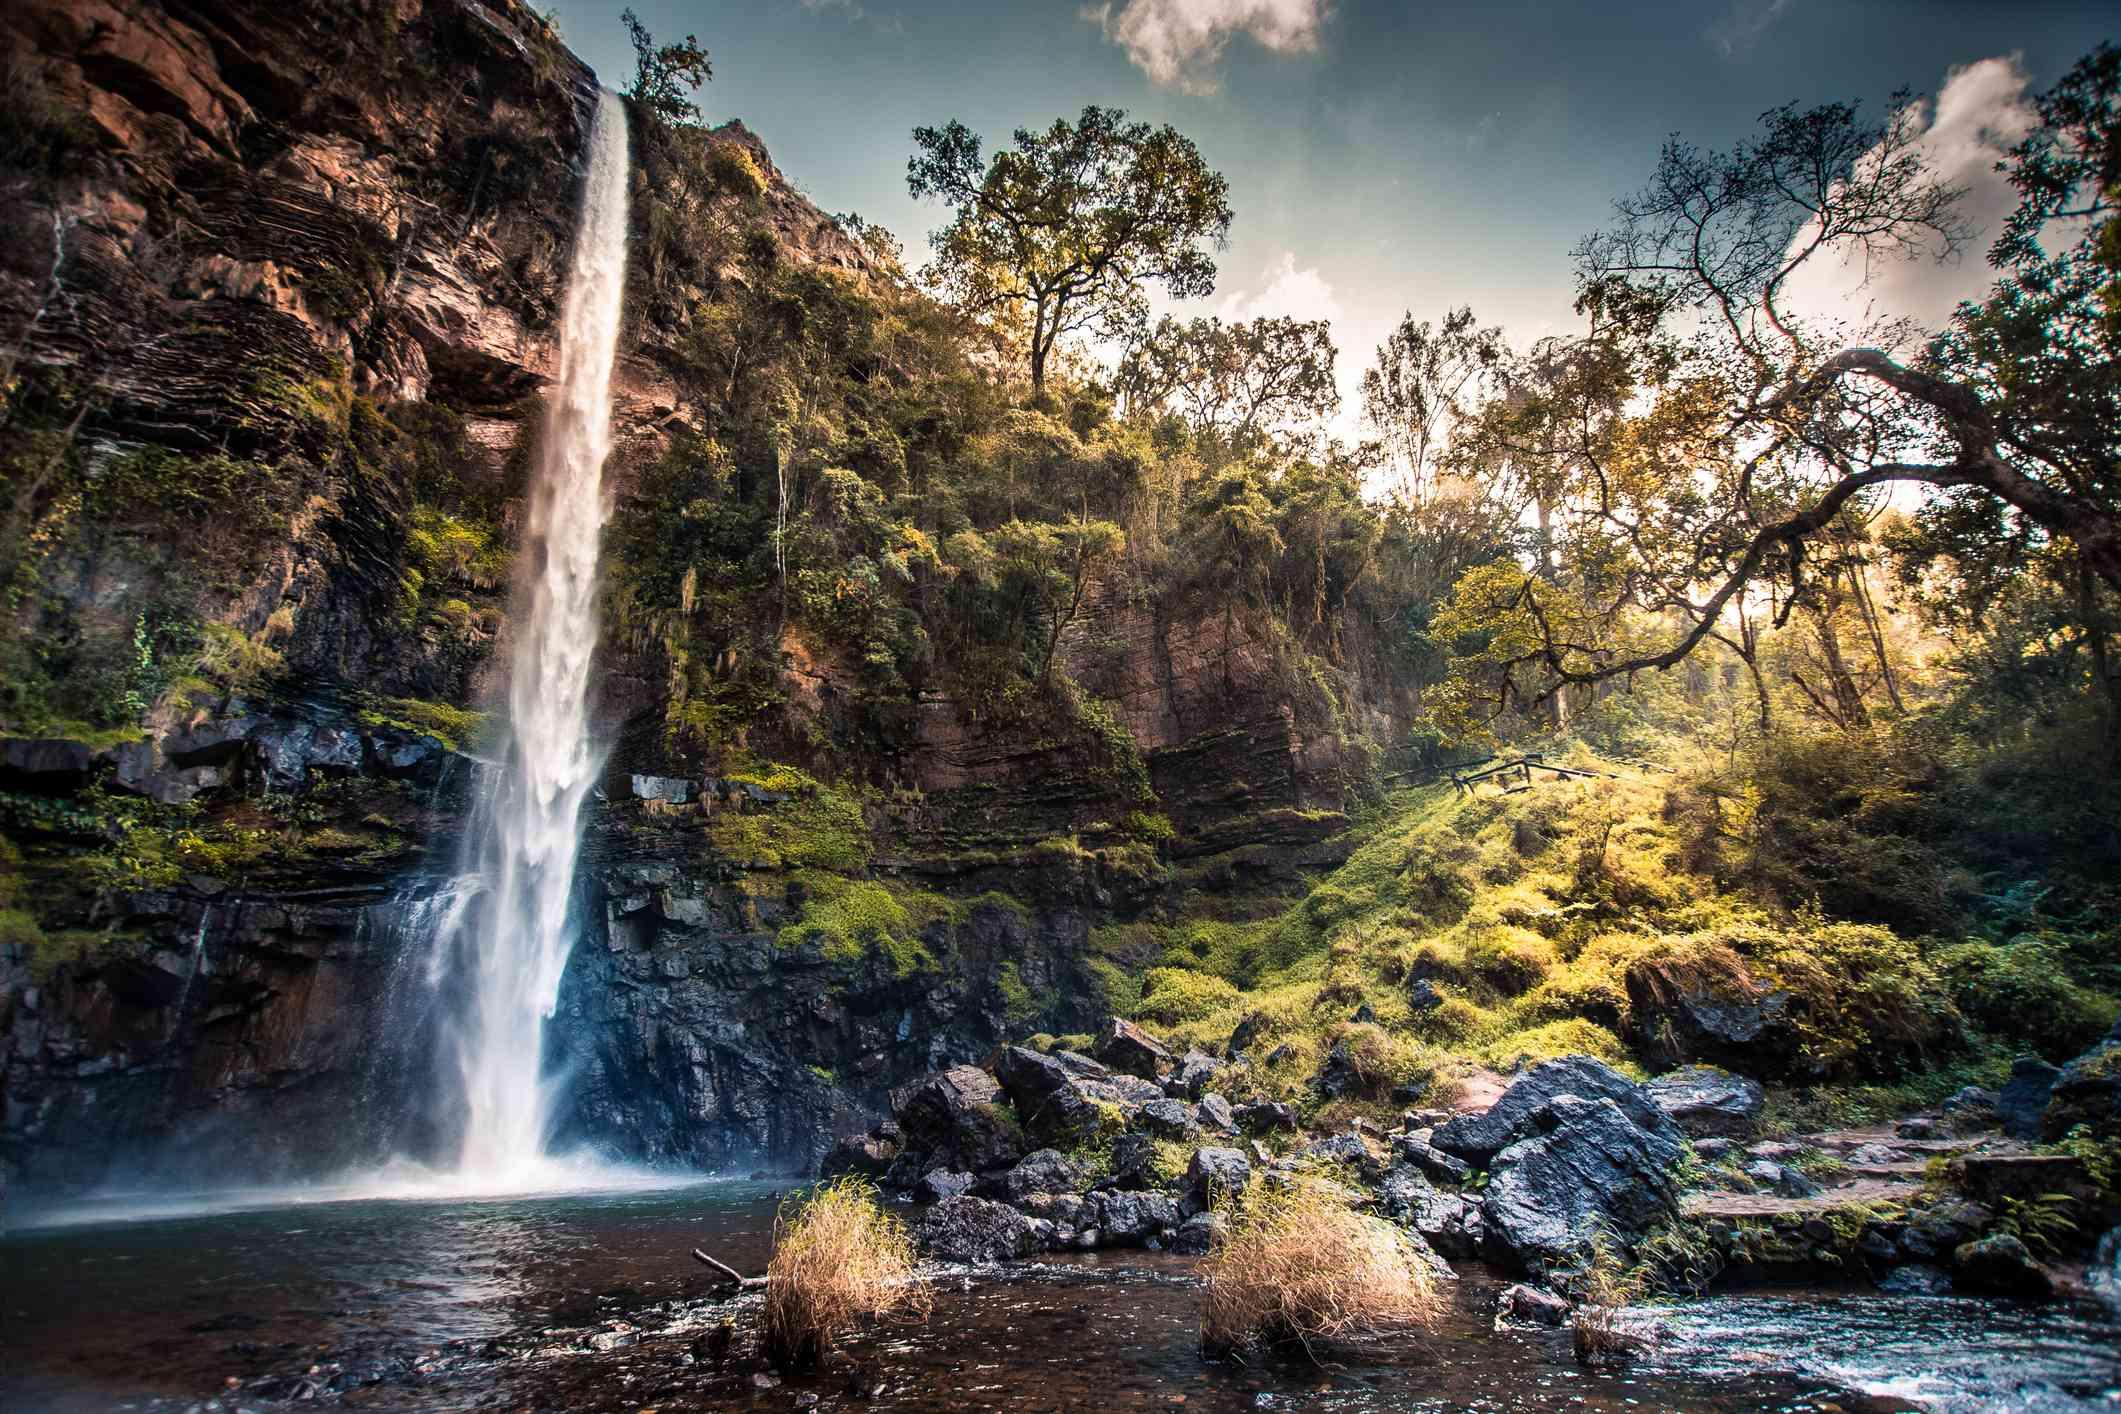 Lone Creek Falls in Mpumalanga, South Africa